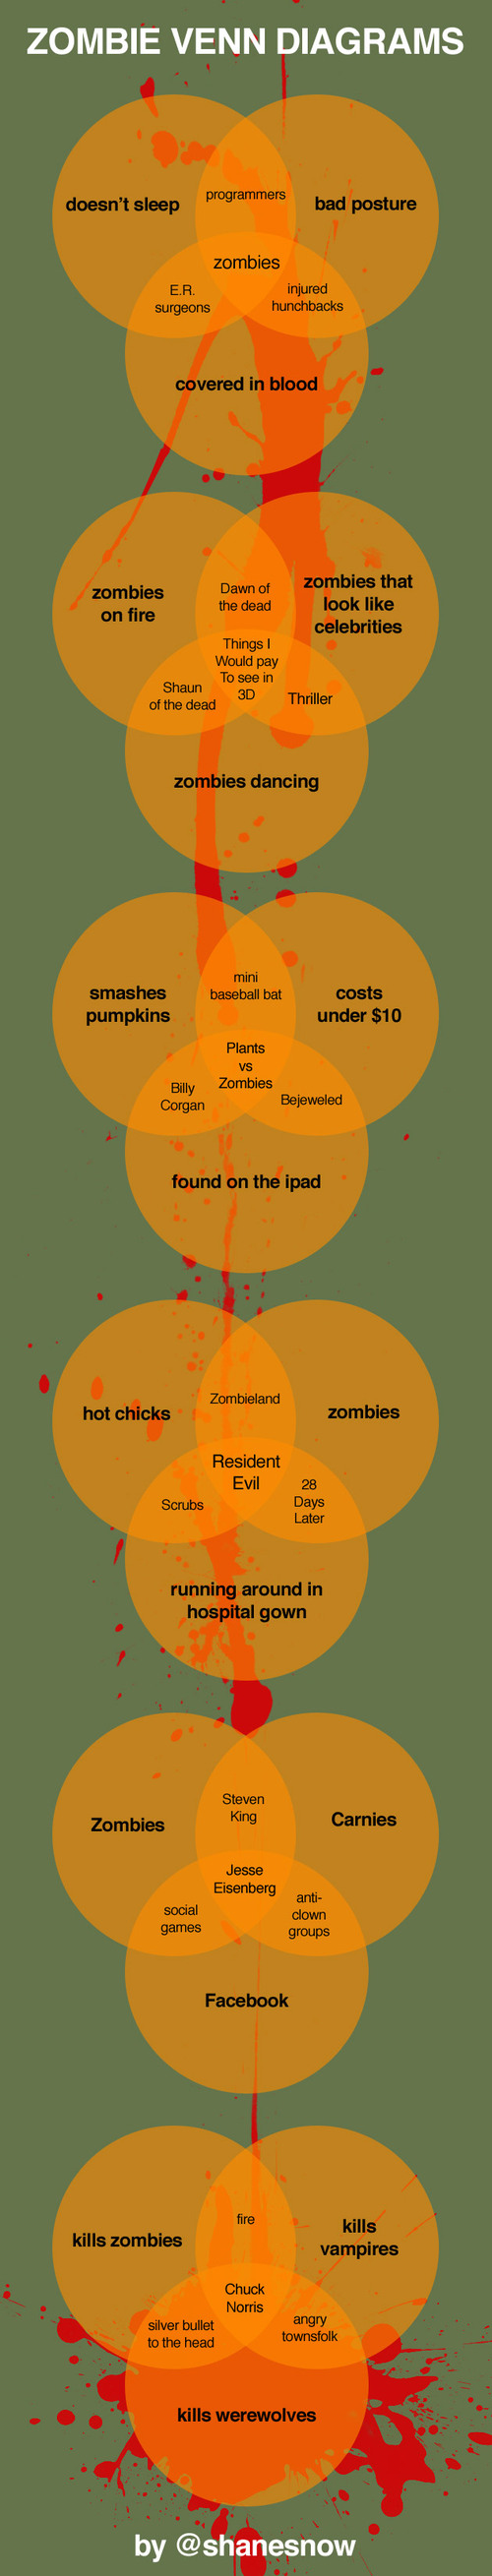 2010-10-30-zombievenndiagrams.jpg